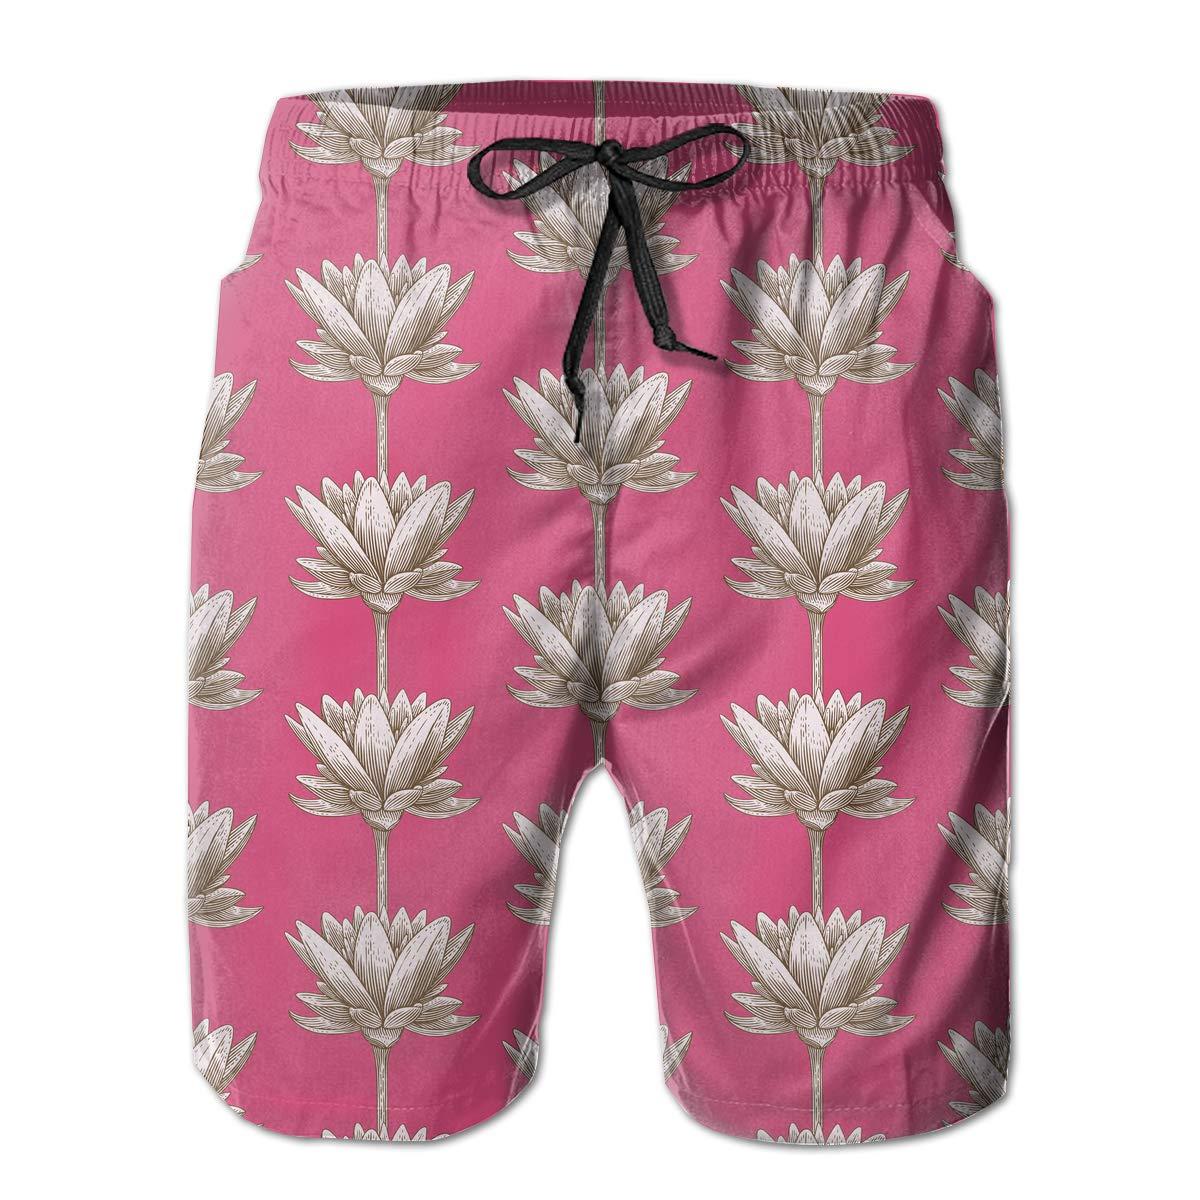 UHT28DG Lotus Pattern Mens Beach Board Shorts Drawstring Bathing Suit